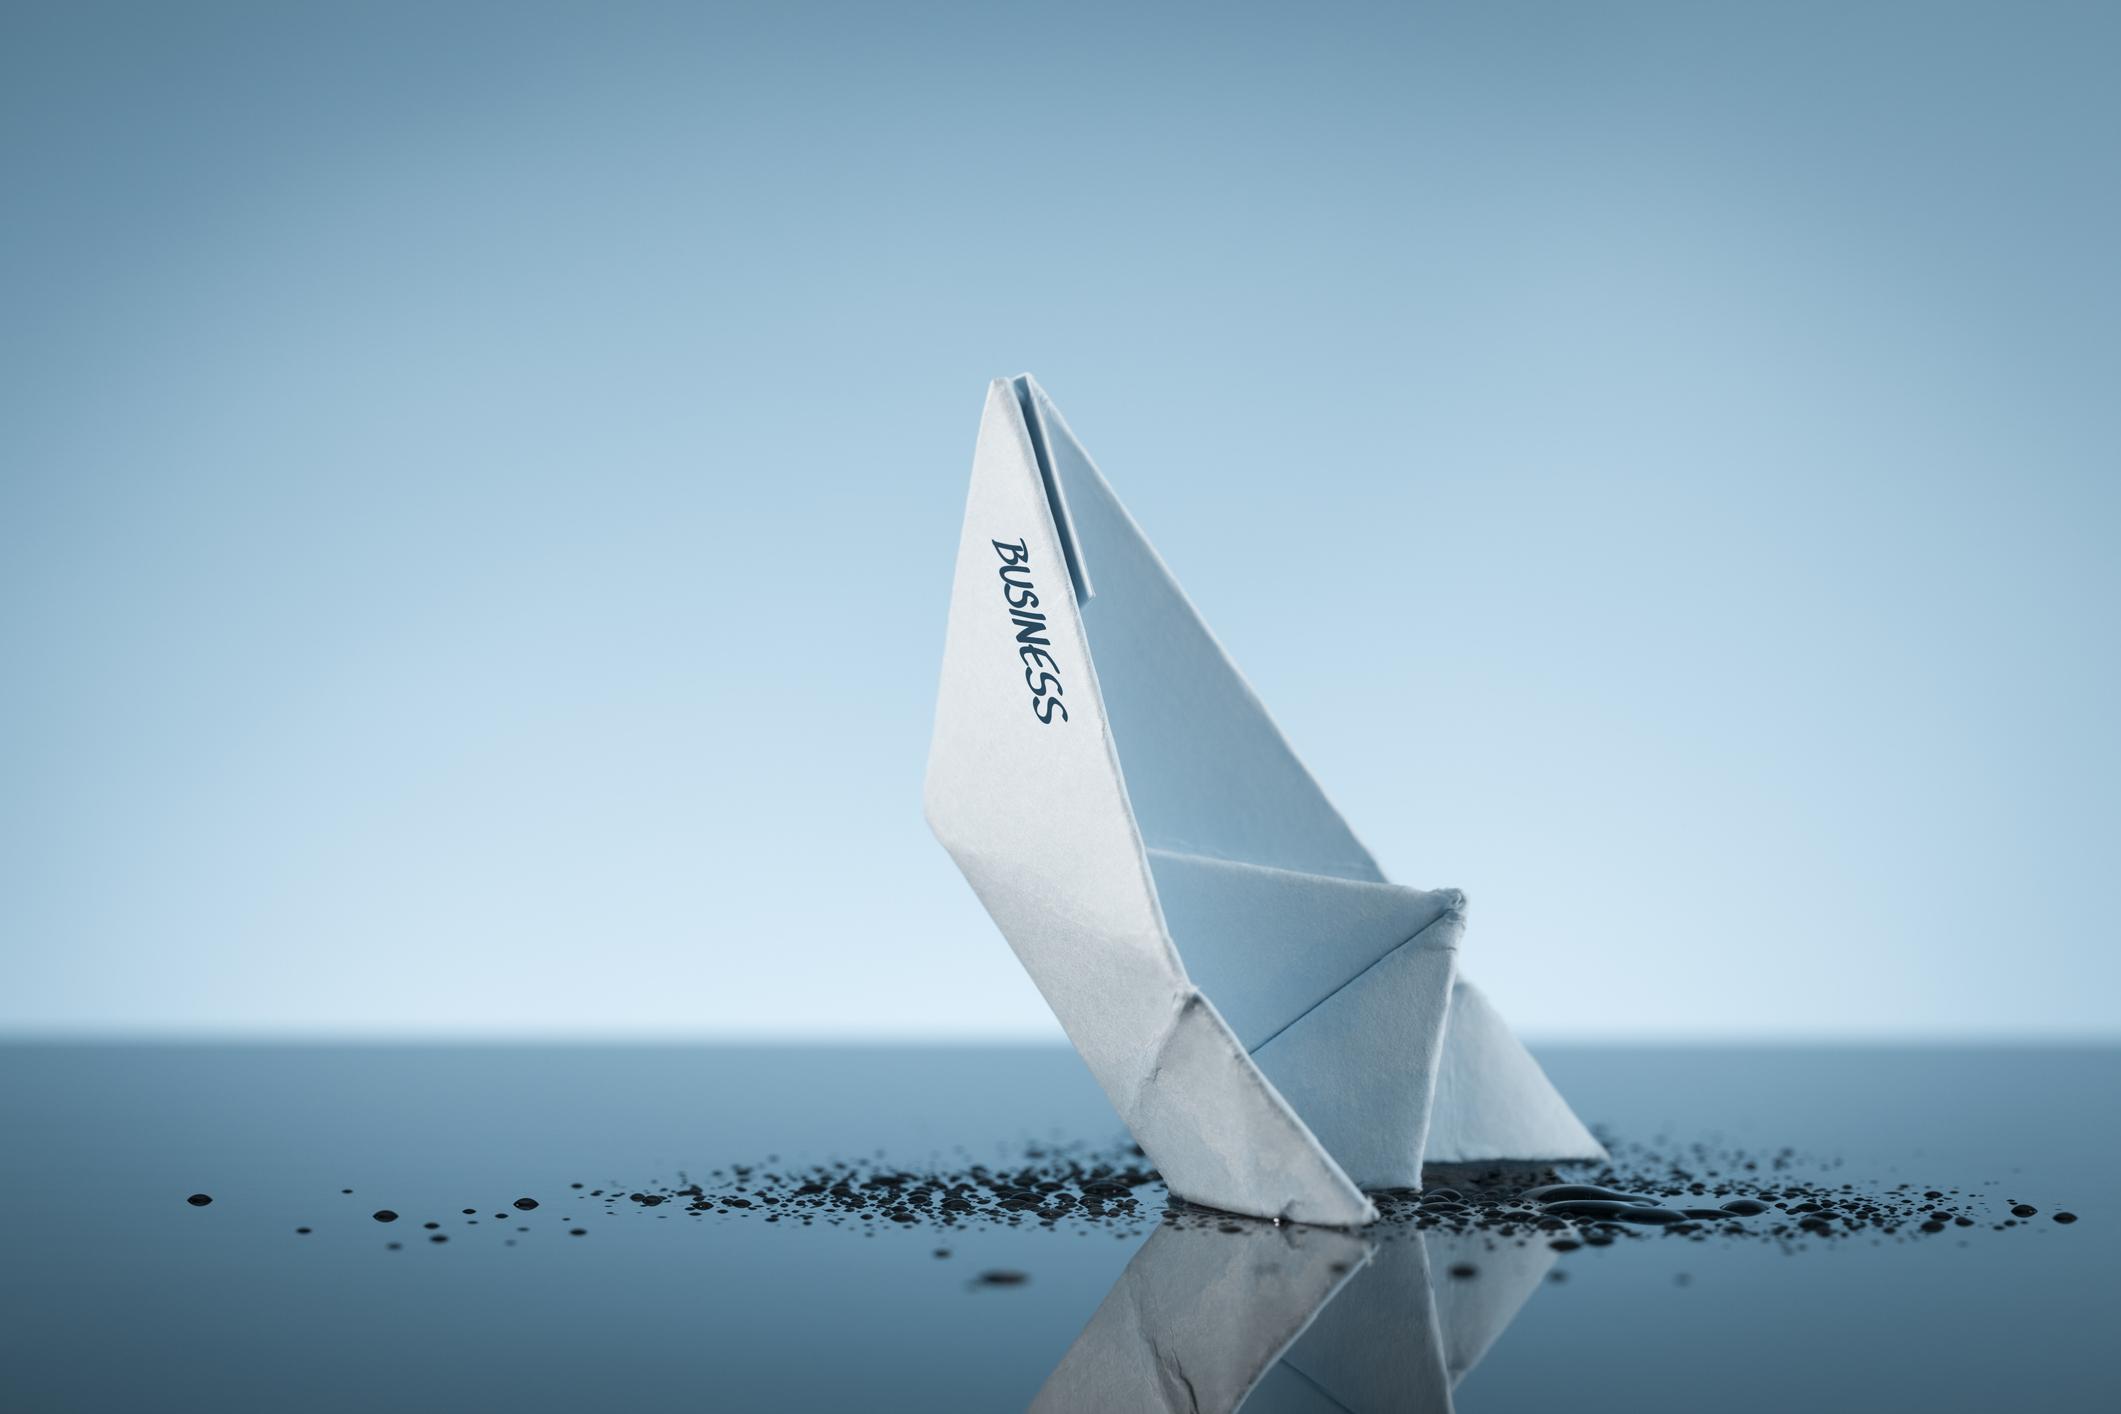 Paper boat sinking into a black liquid.